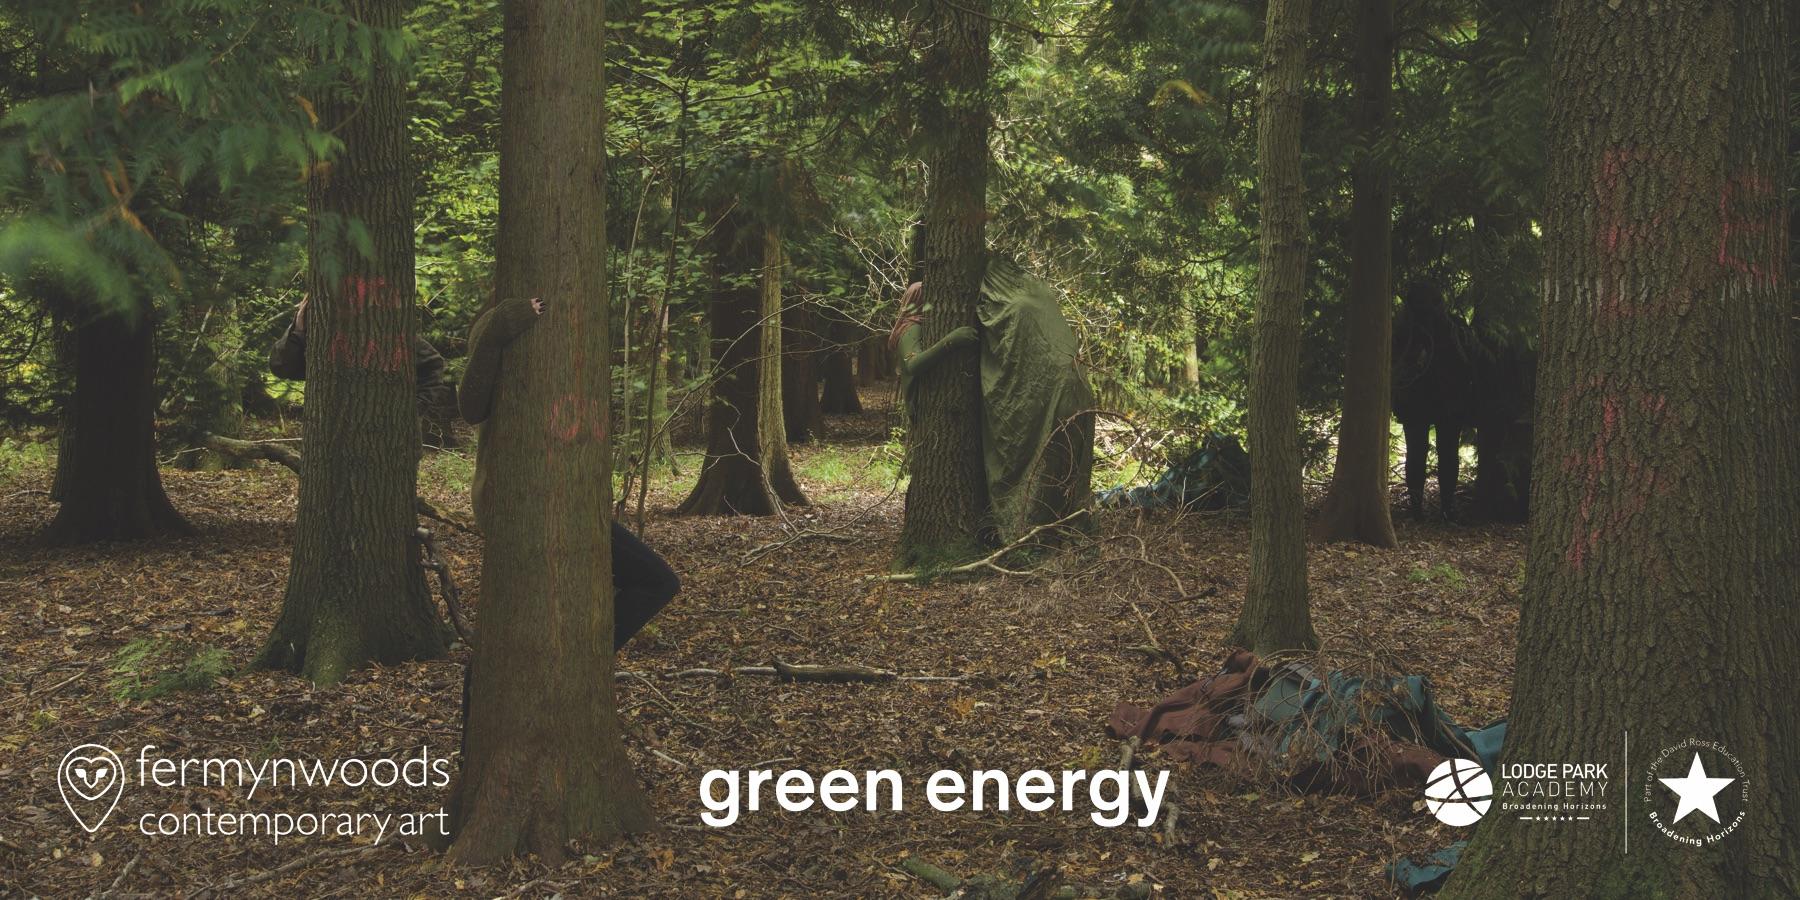 Green Screen - Lodge Park